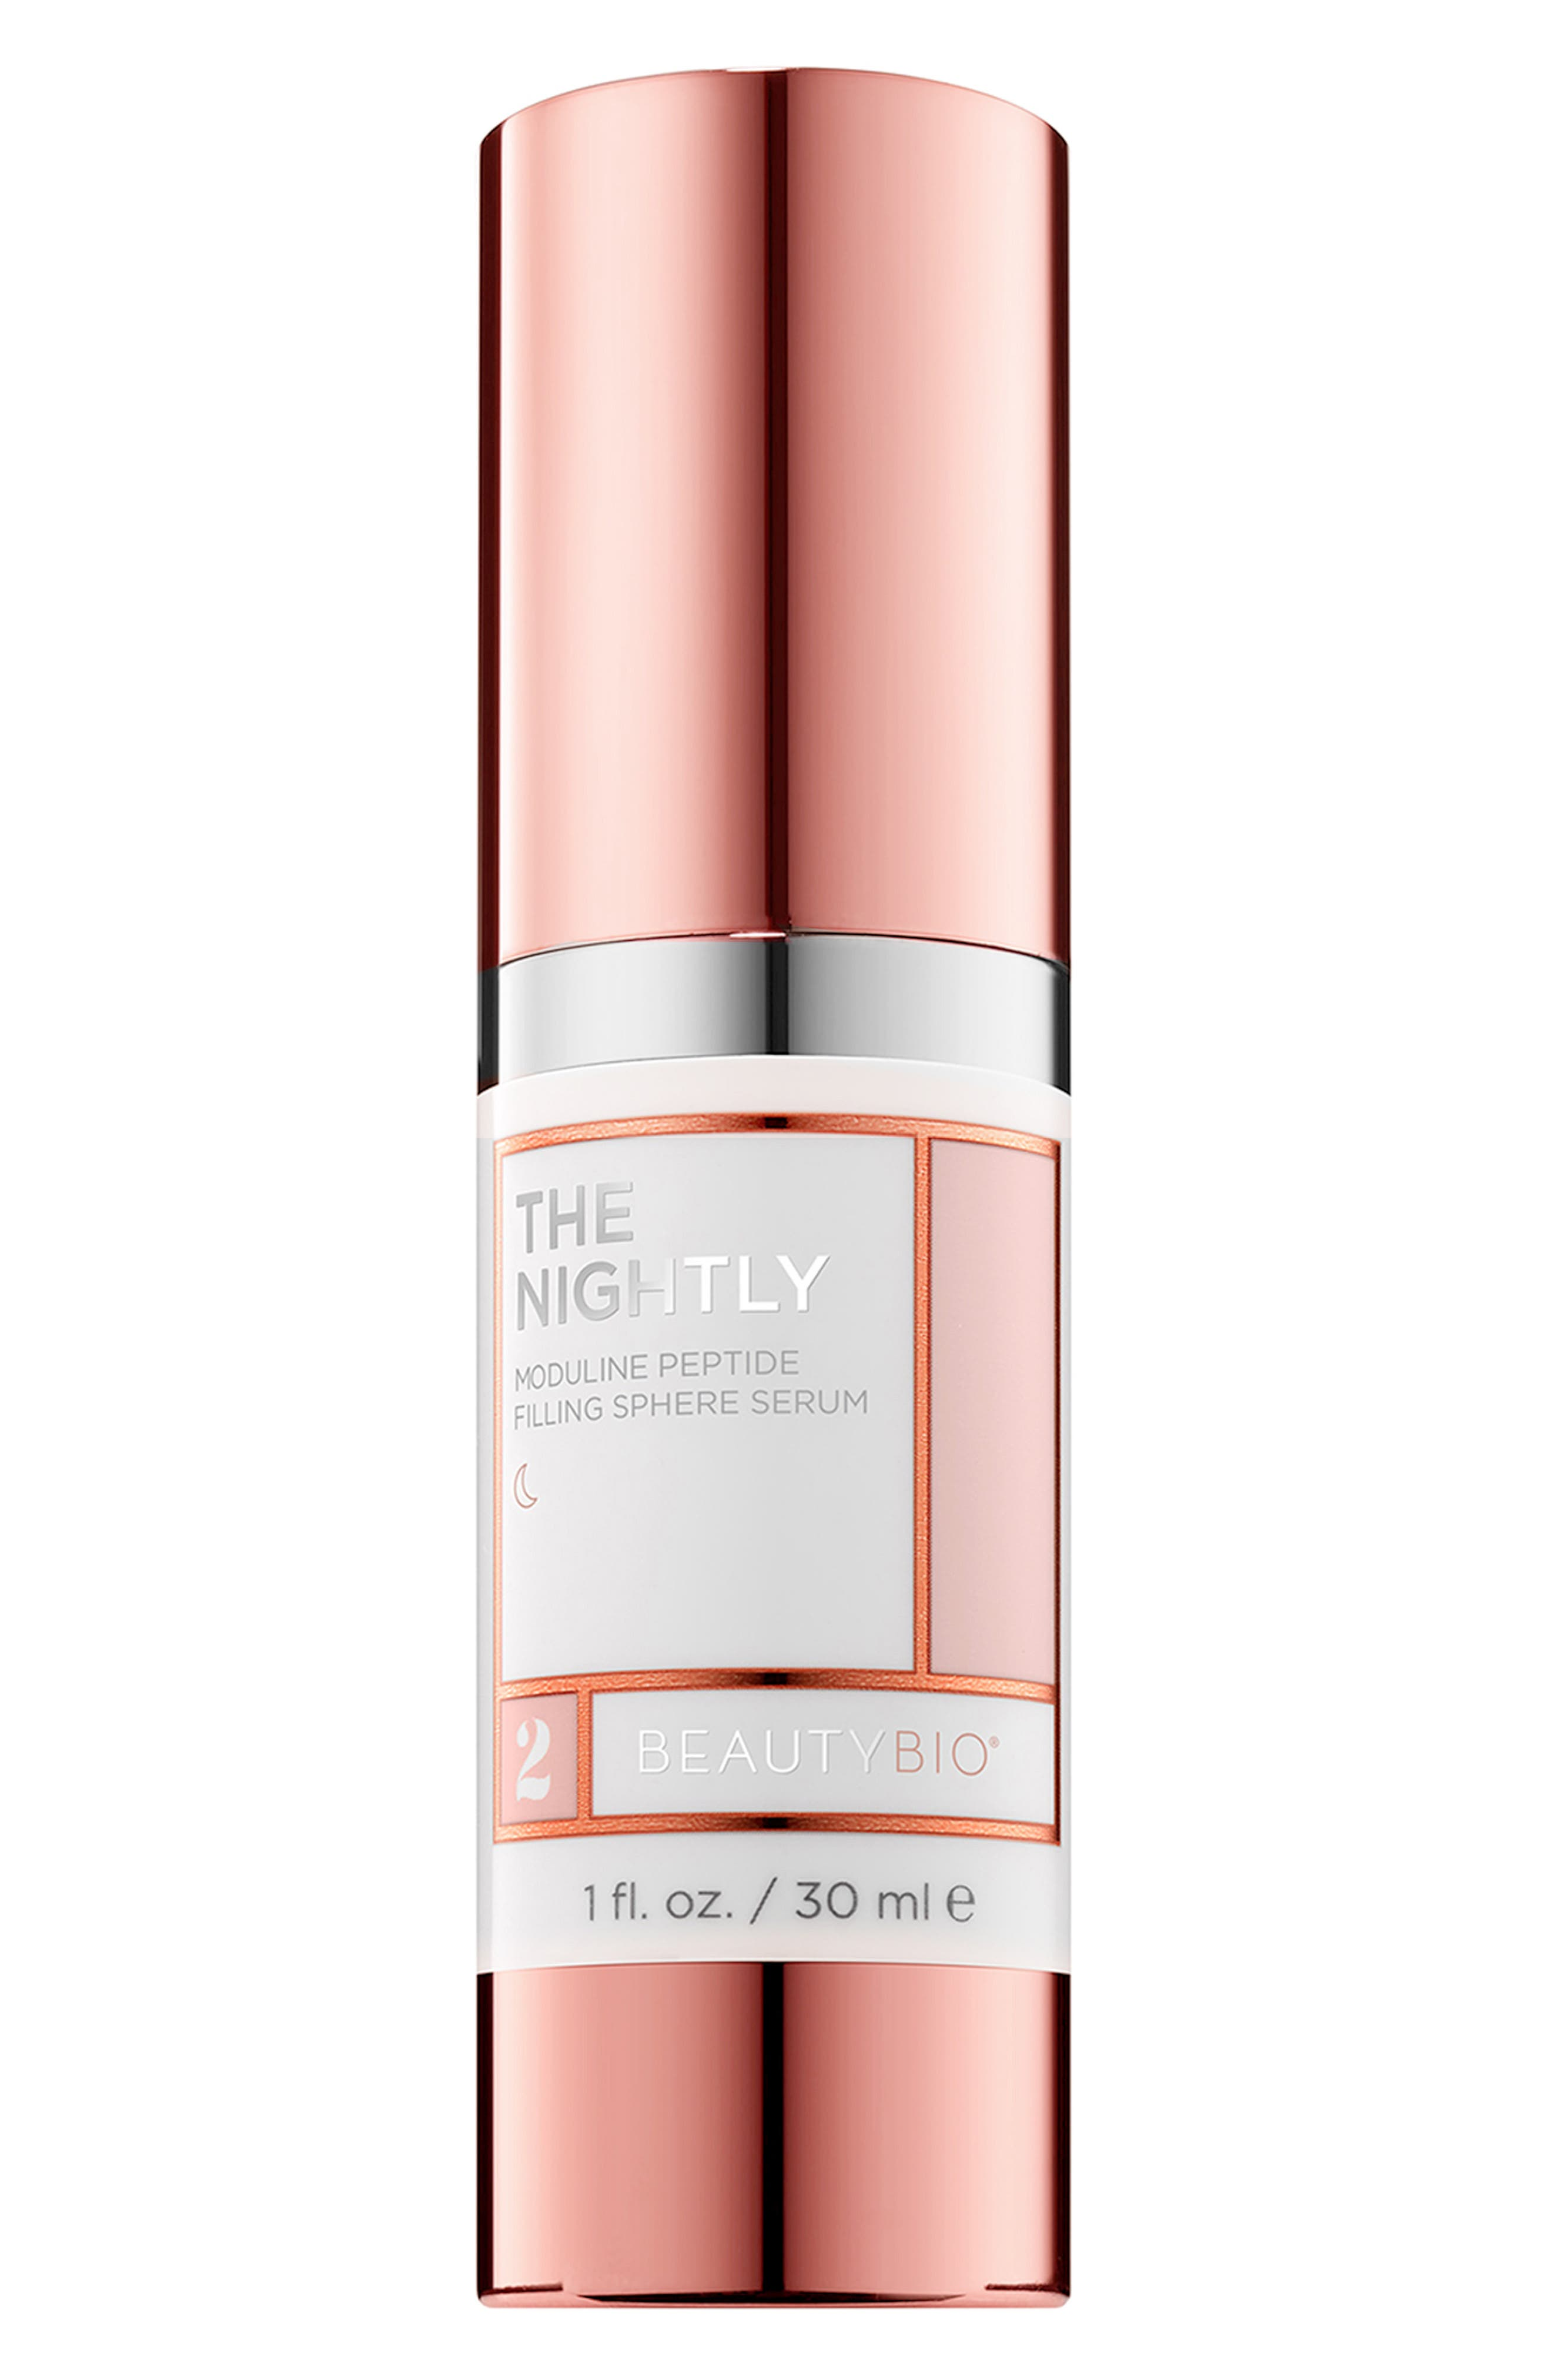 BeautyBio The Nightly Moduline Peptide Filling Sphere Serum